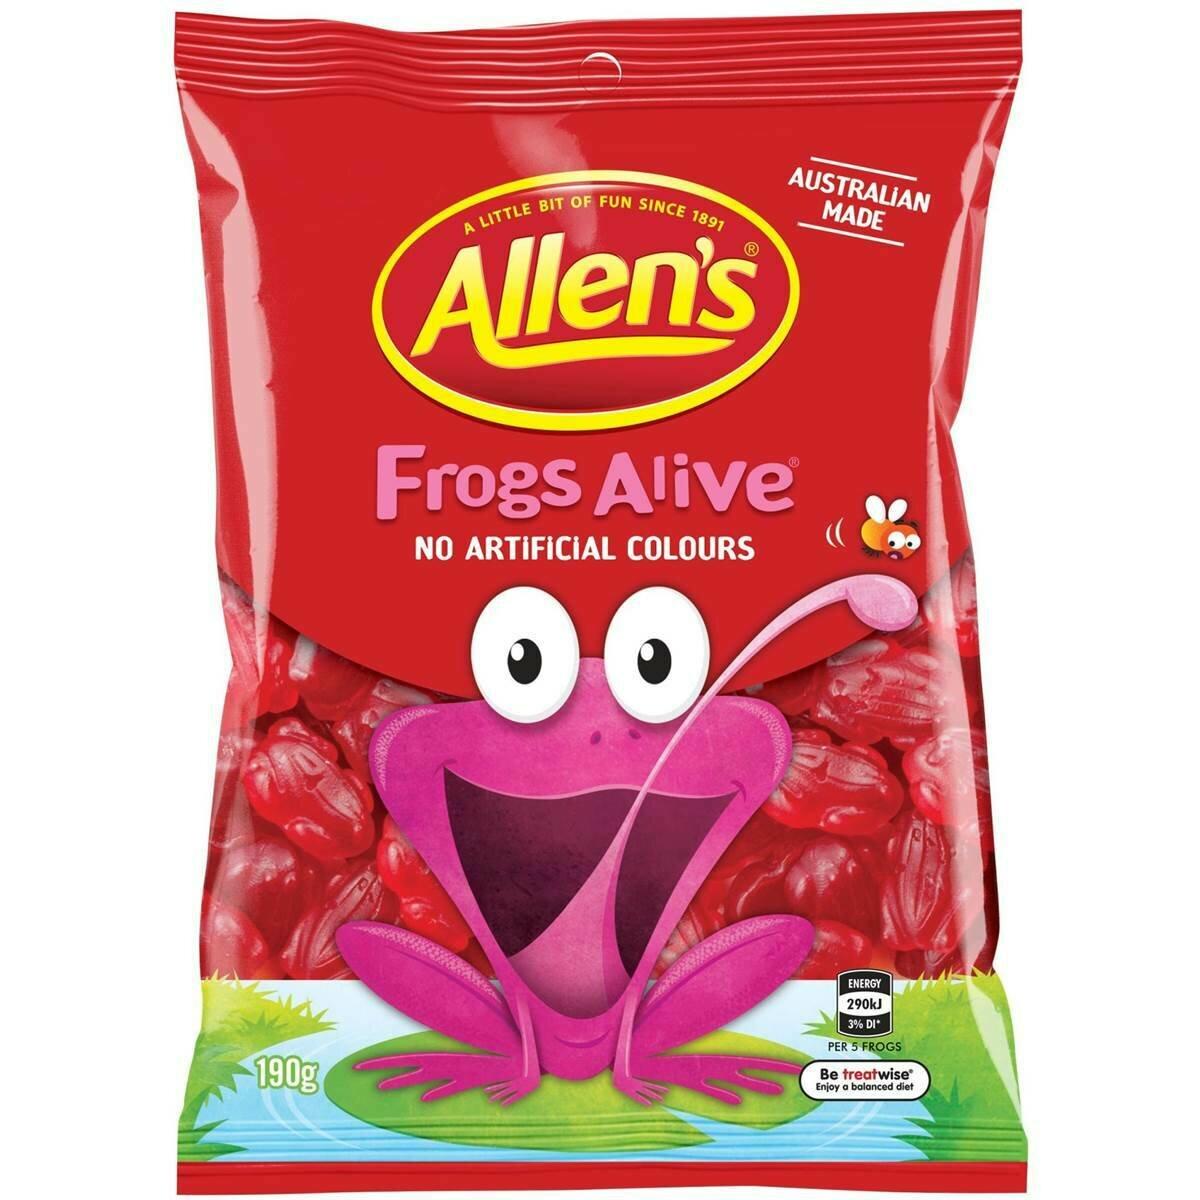 Allens Frogs Alive 190G